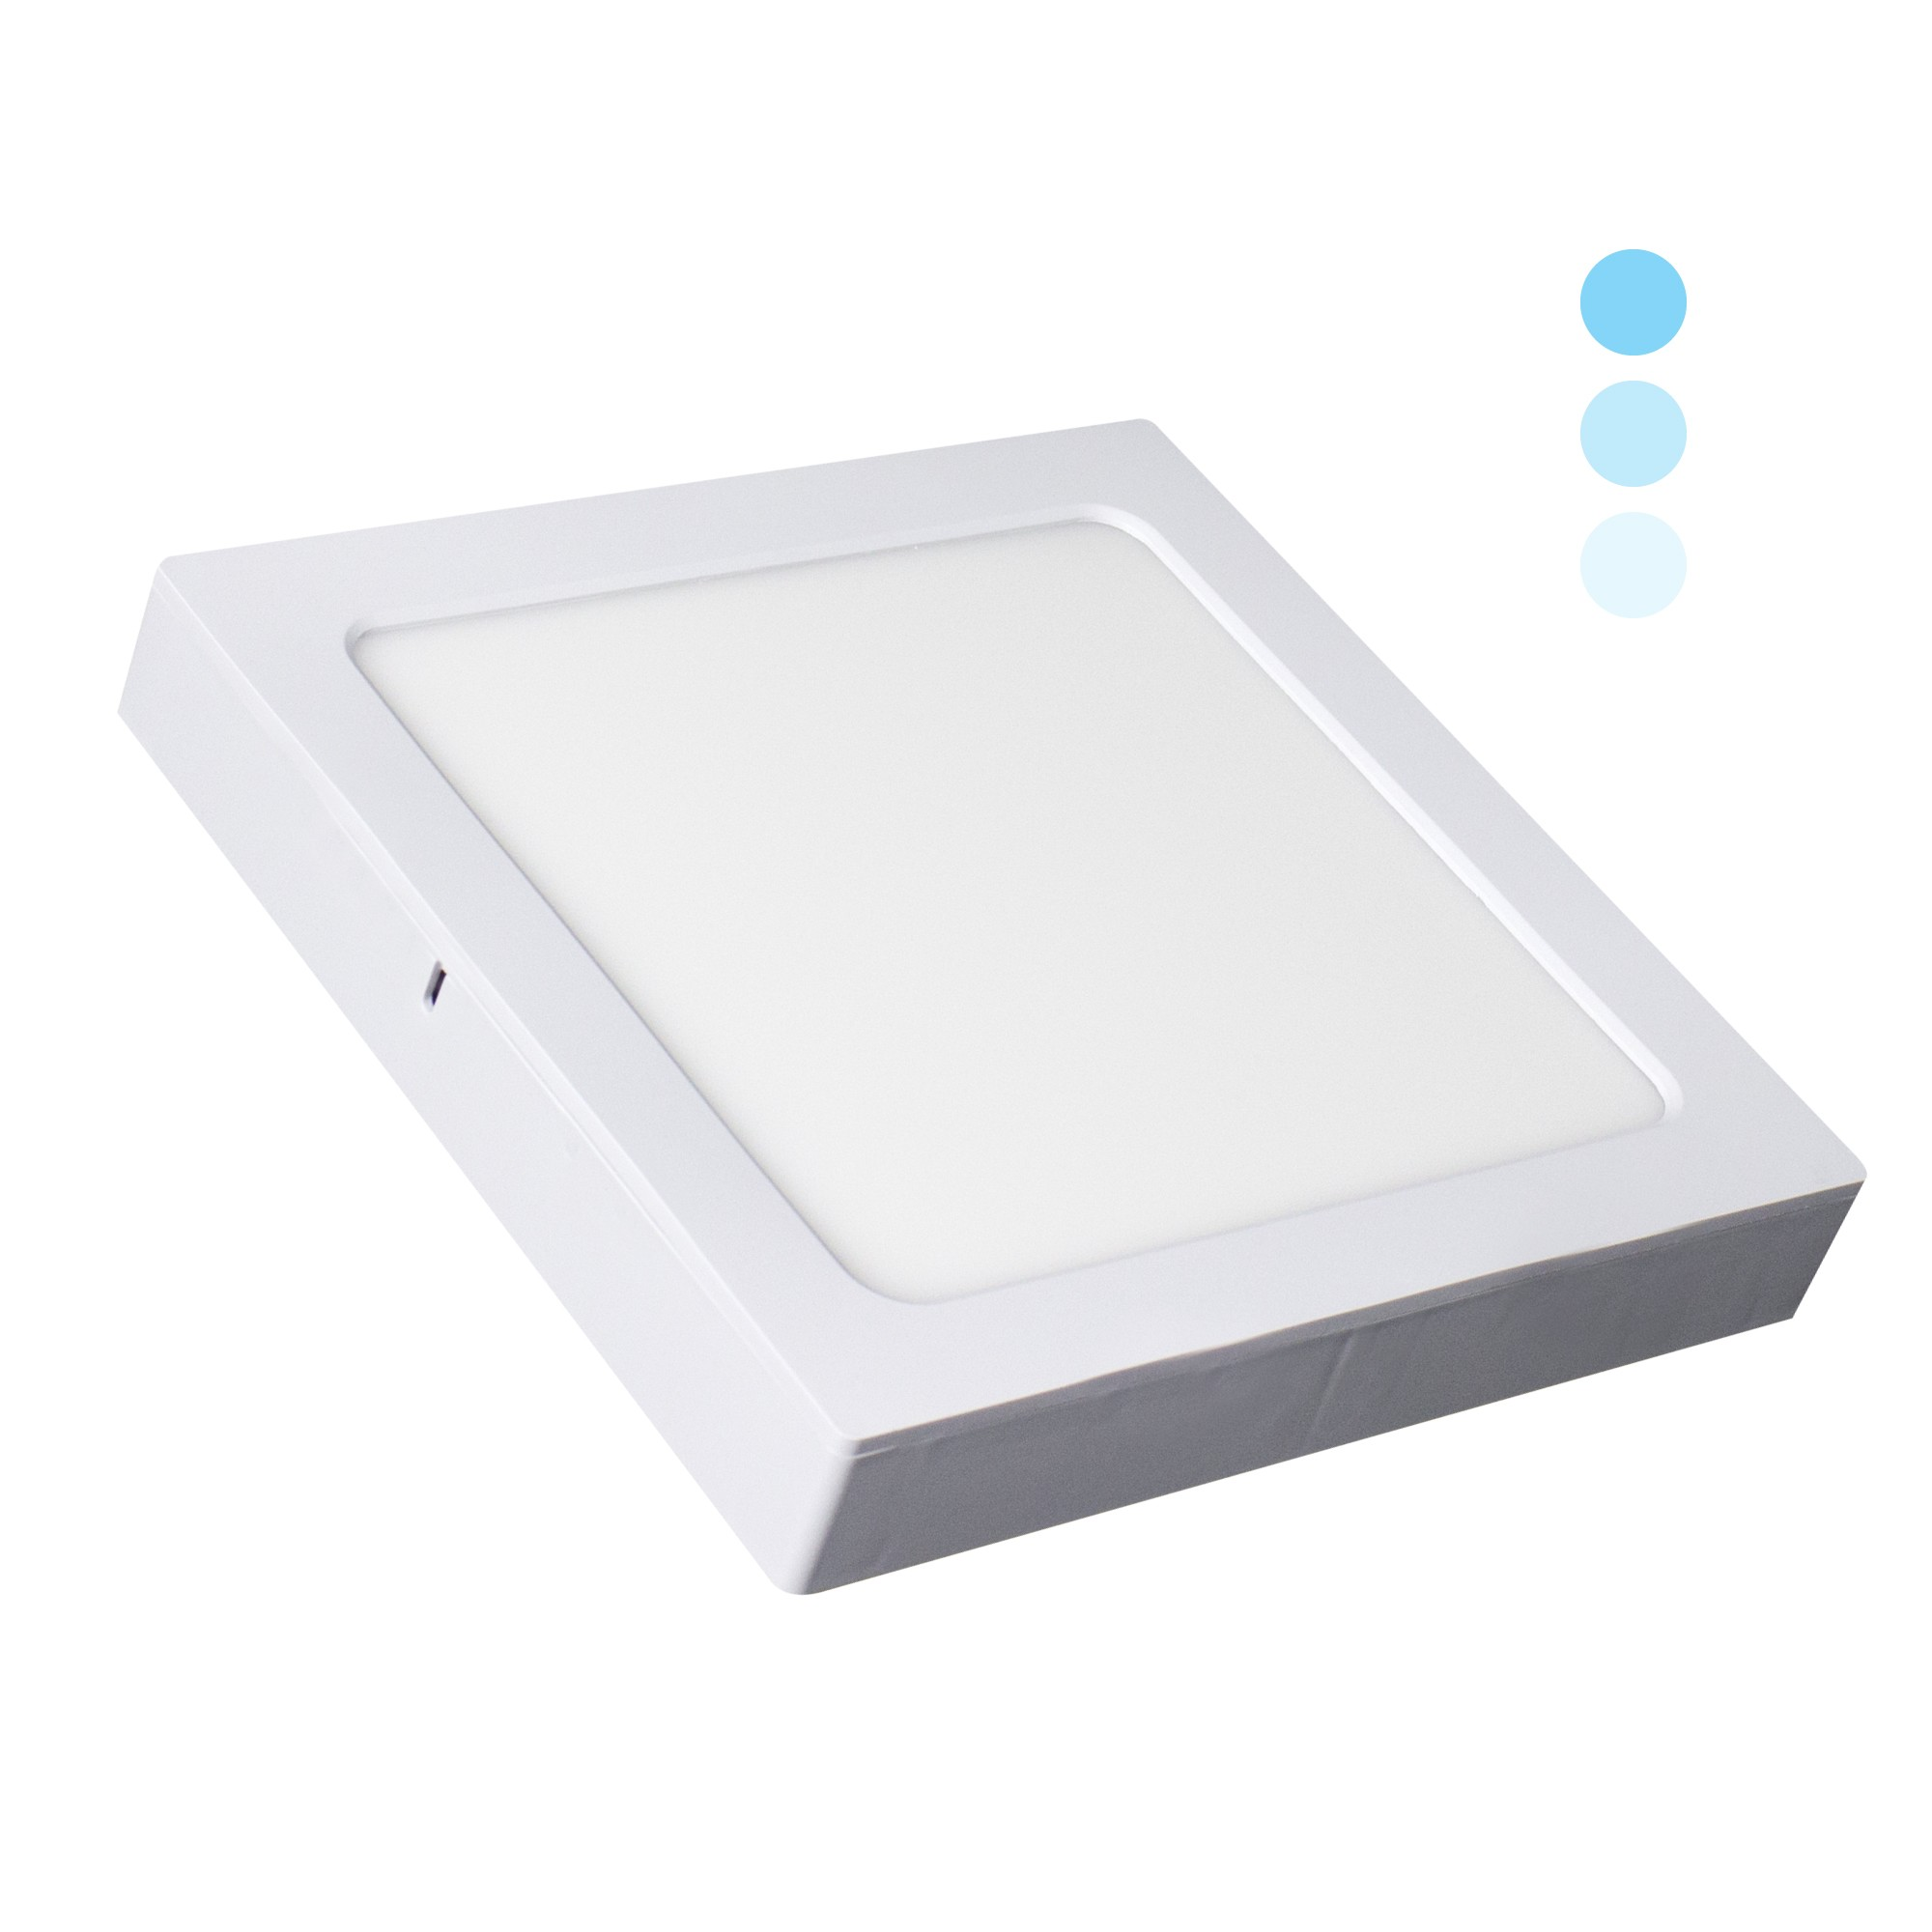 Painel LED Quadrado 16W Luz Branca Tripla Intensidade 1200lm - Ecoforce